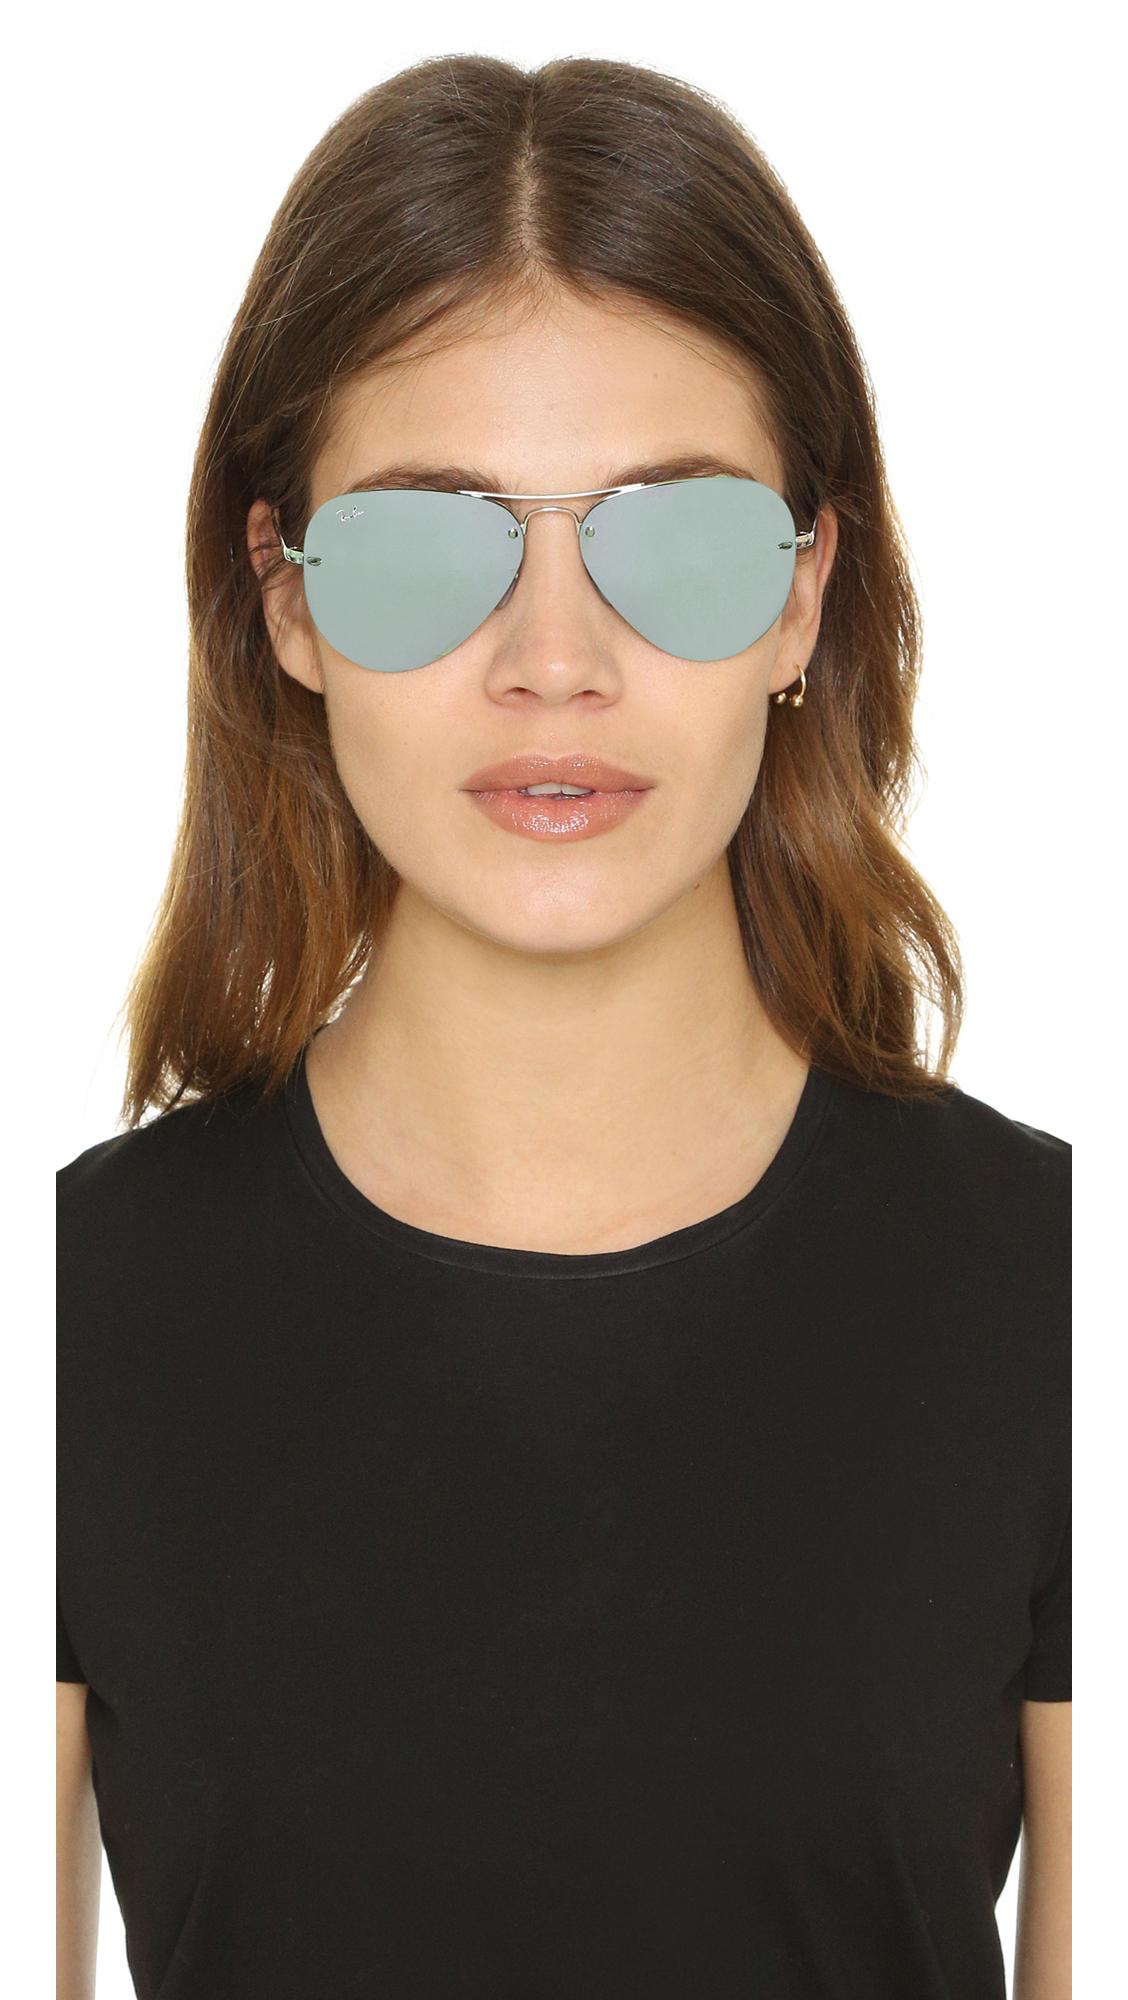 6b6aa2f745 ... new arrivals lyst ray ban highstreet mirrored aviator sunglasses in  black b1c71 3c661